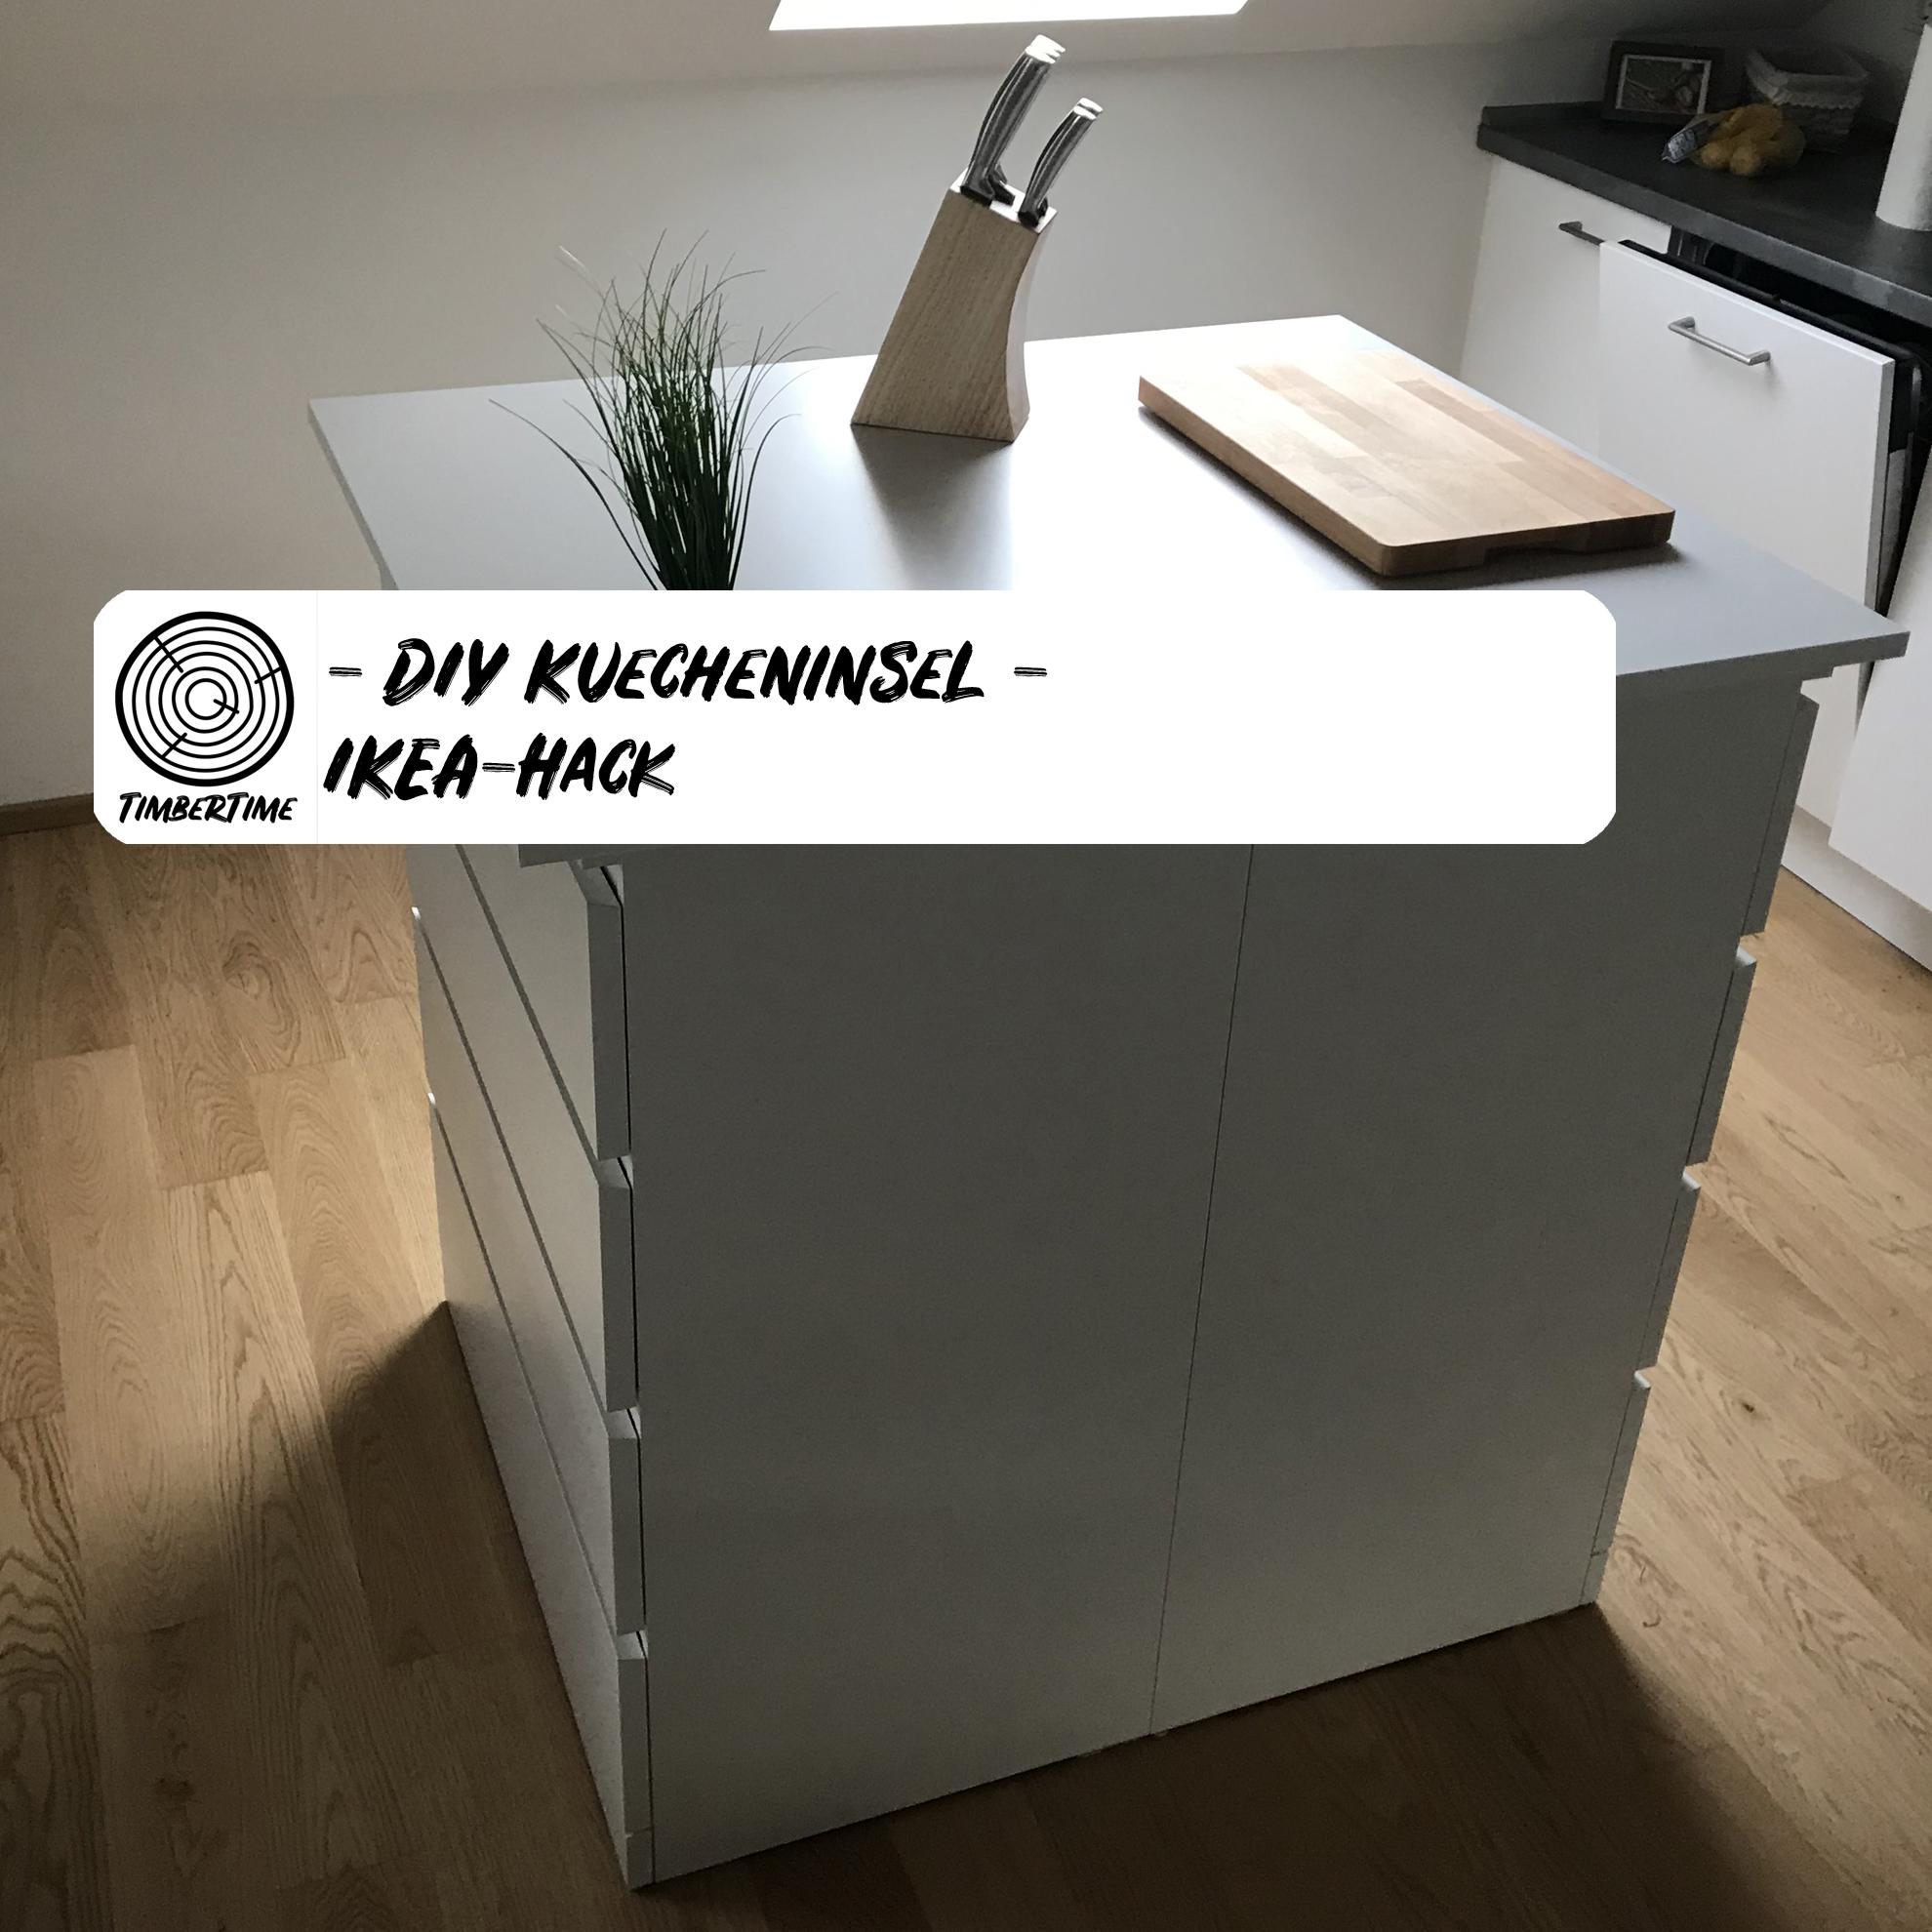 Full Size of Kücheninsel Diy Kcheninsel Selber Bauen Ikea Hack Wohnzimmer Kücheninsel